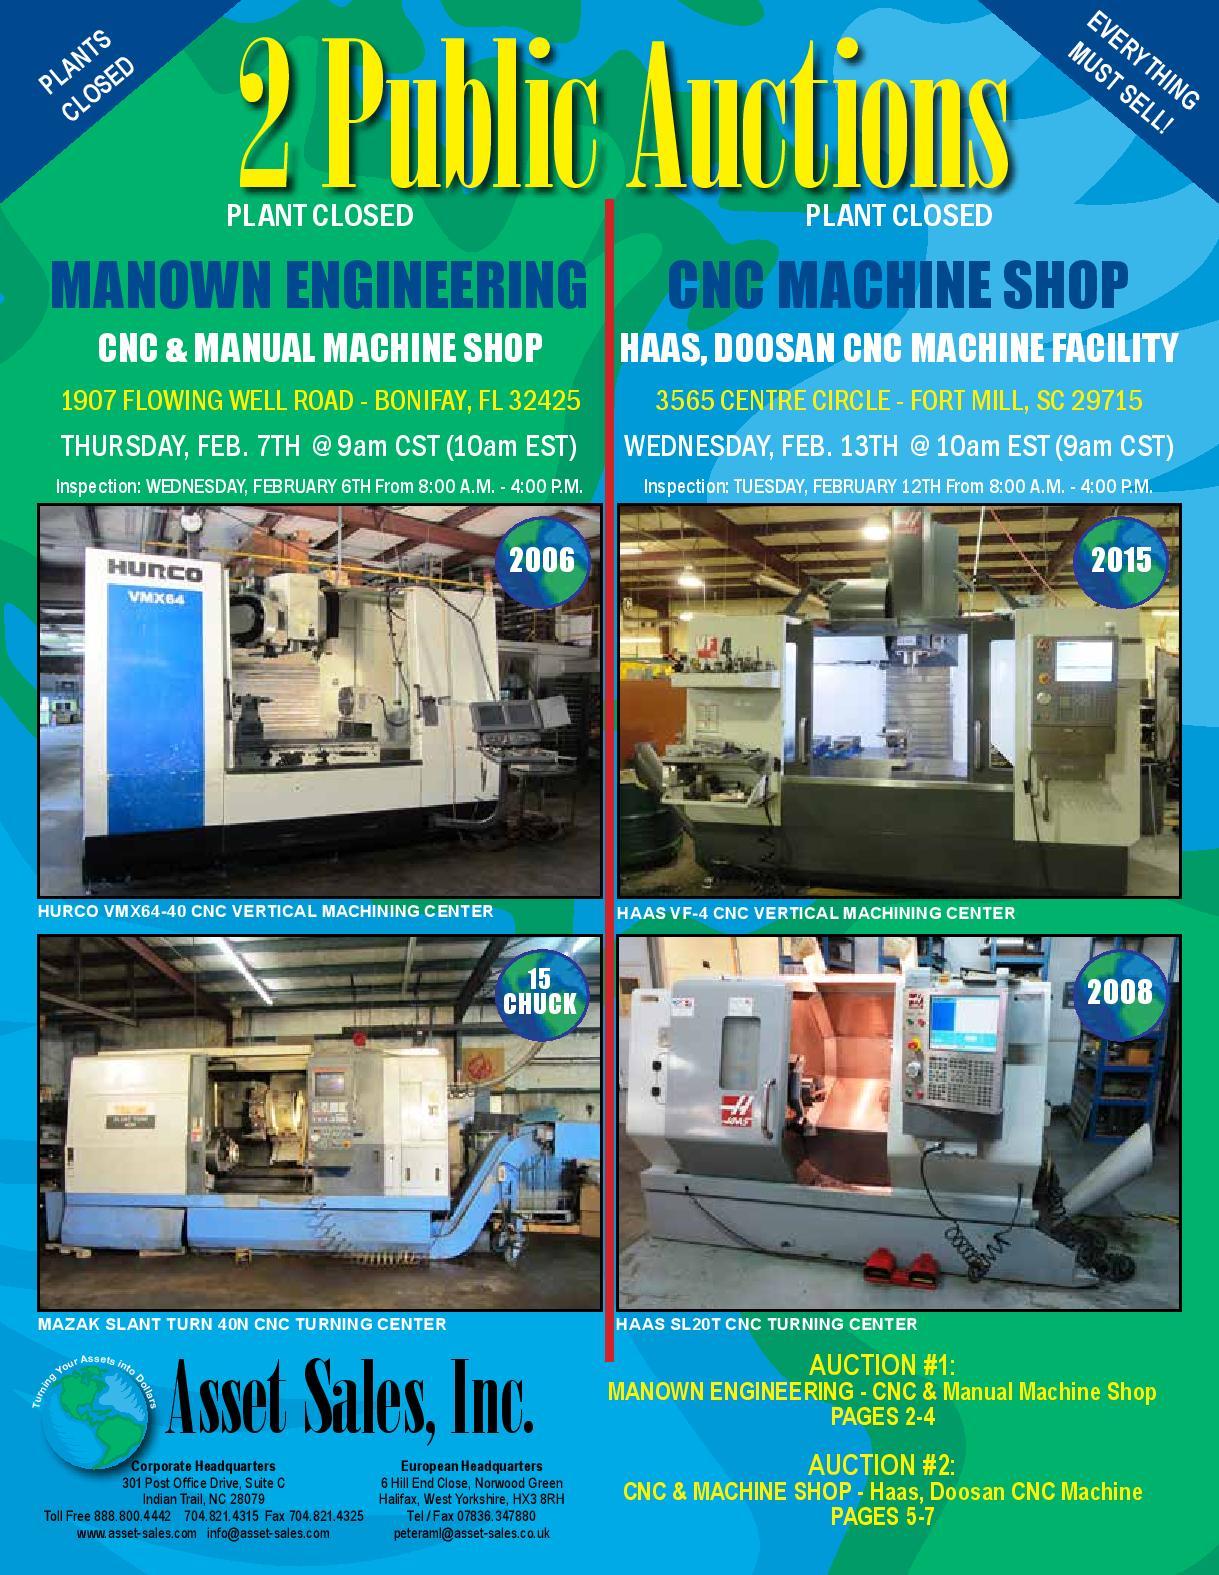 CNC & MACHINE SHOP EQUIPMENT: Haas, Doosan CNC Machine Facility